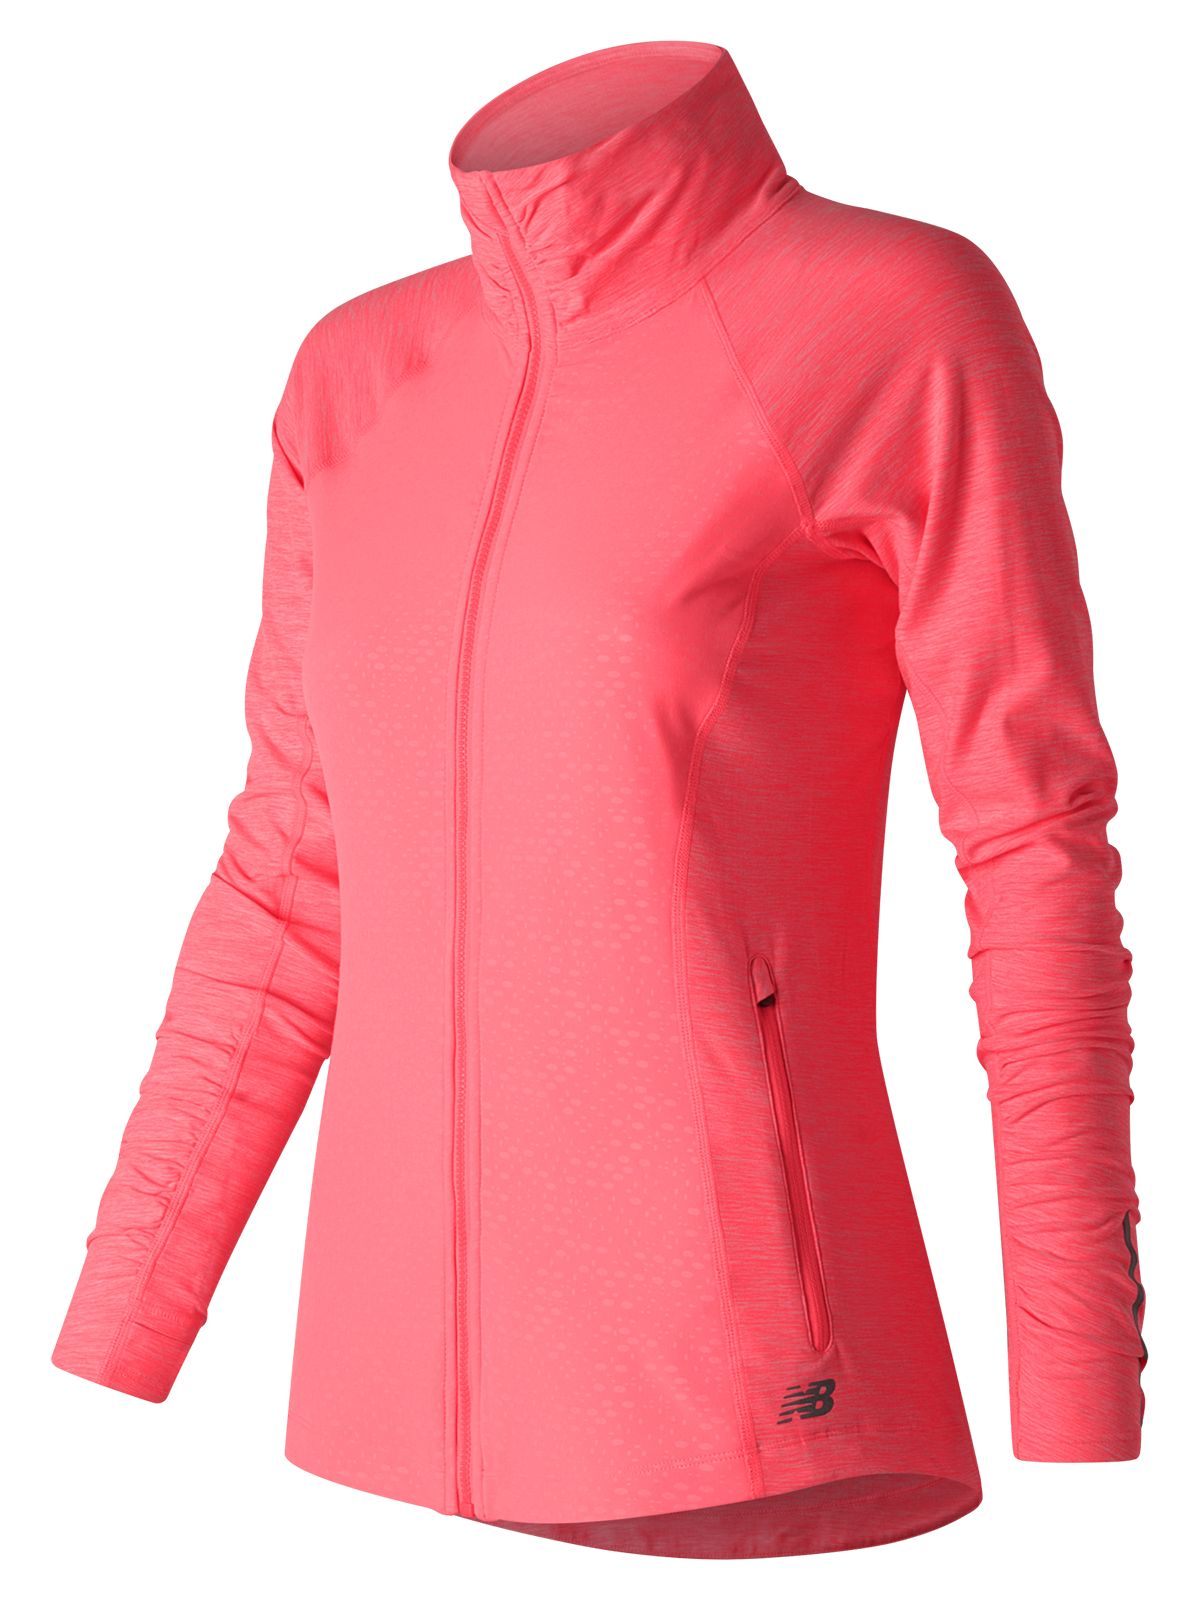 New Balance Women's Mixed Media En Route Jacket Pink